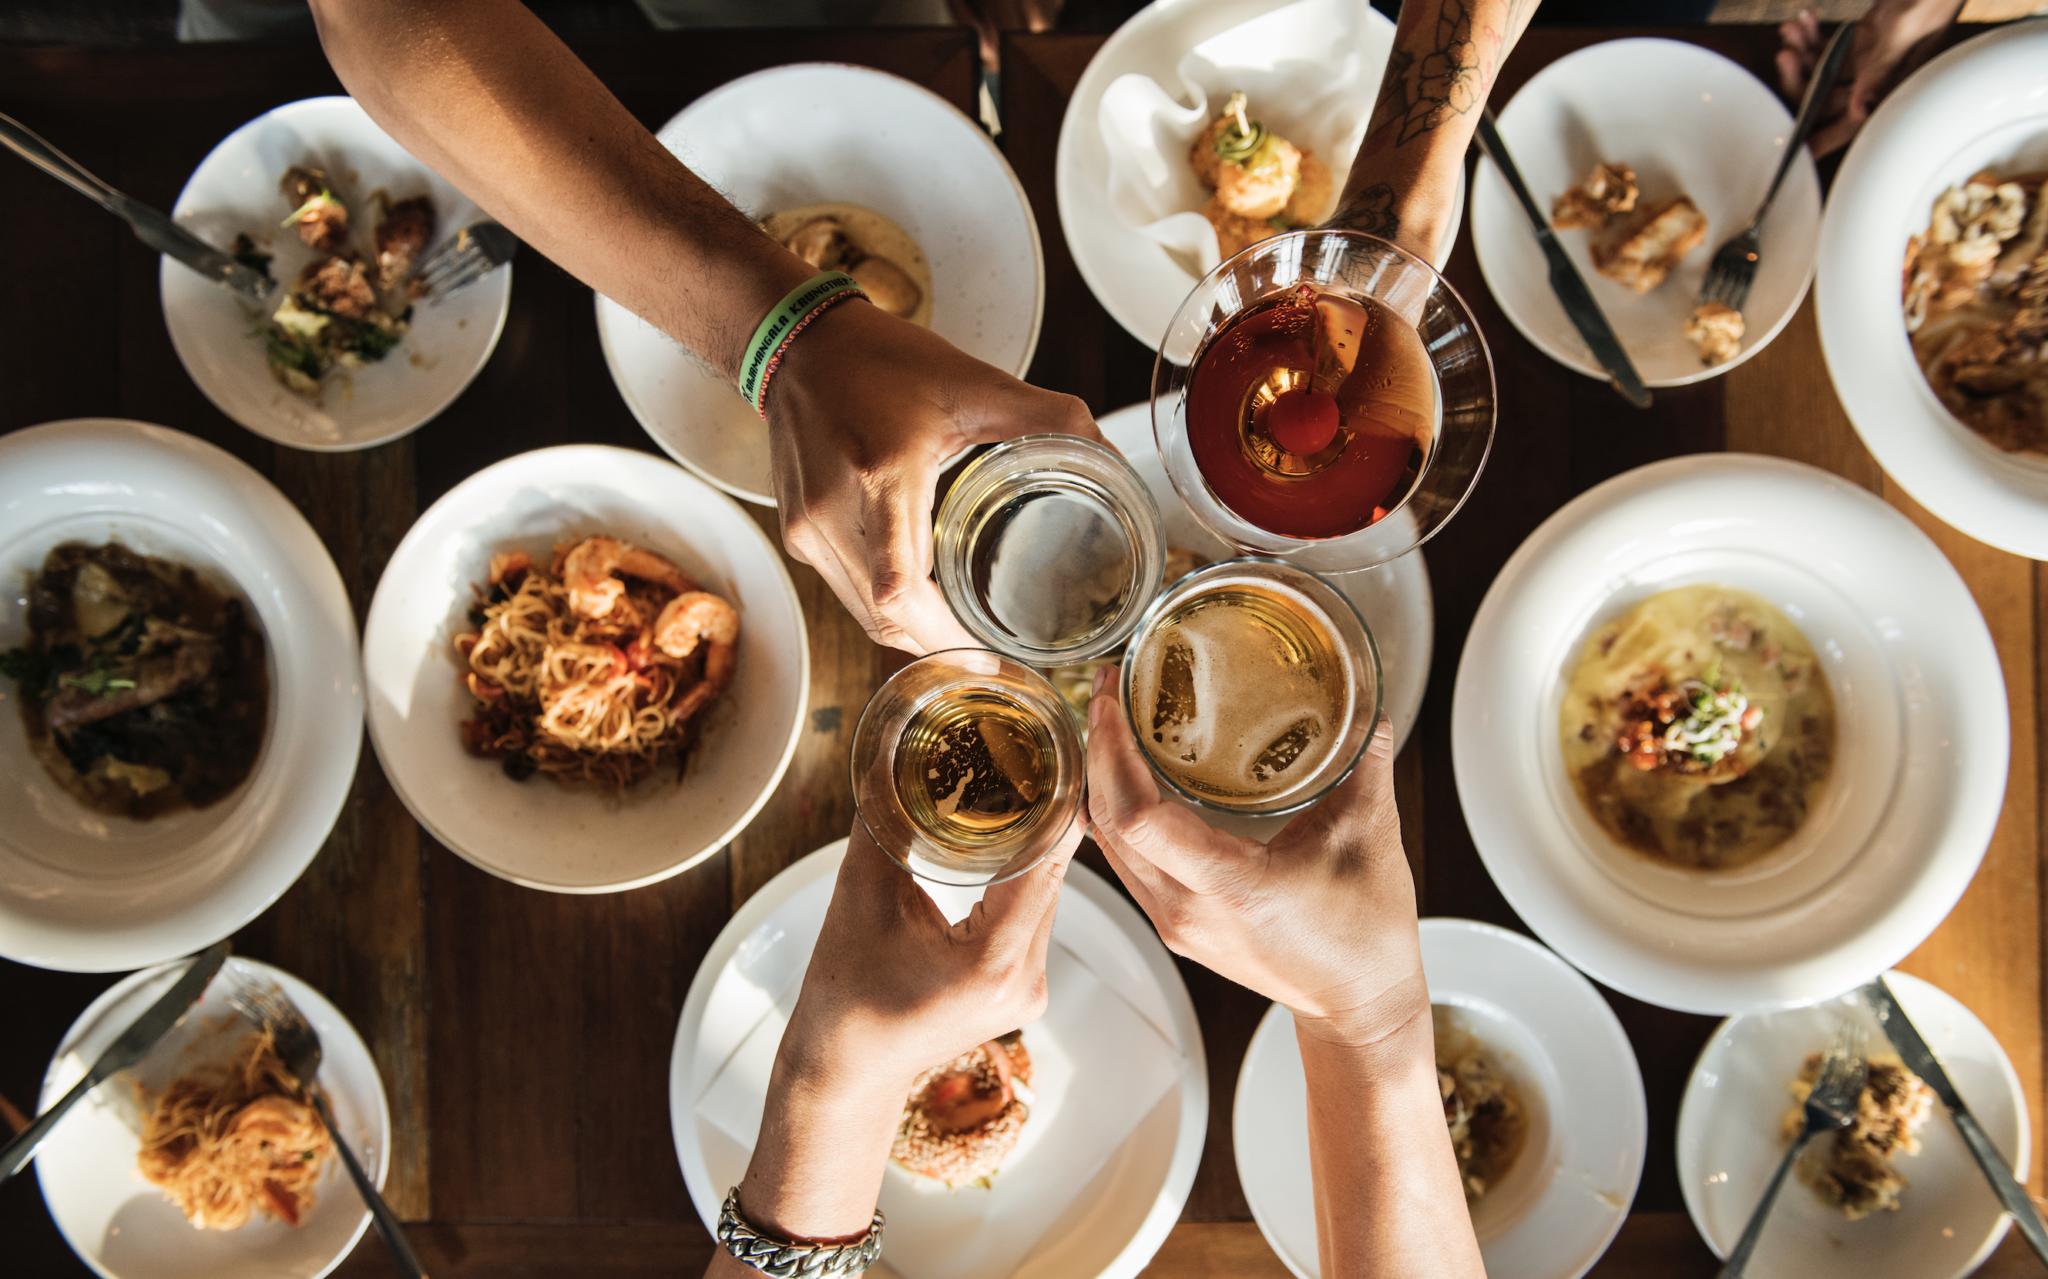 Cucine Low Cost Brescia the 10 most unique restaurants in italy: where taste meets